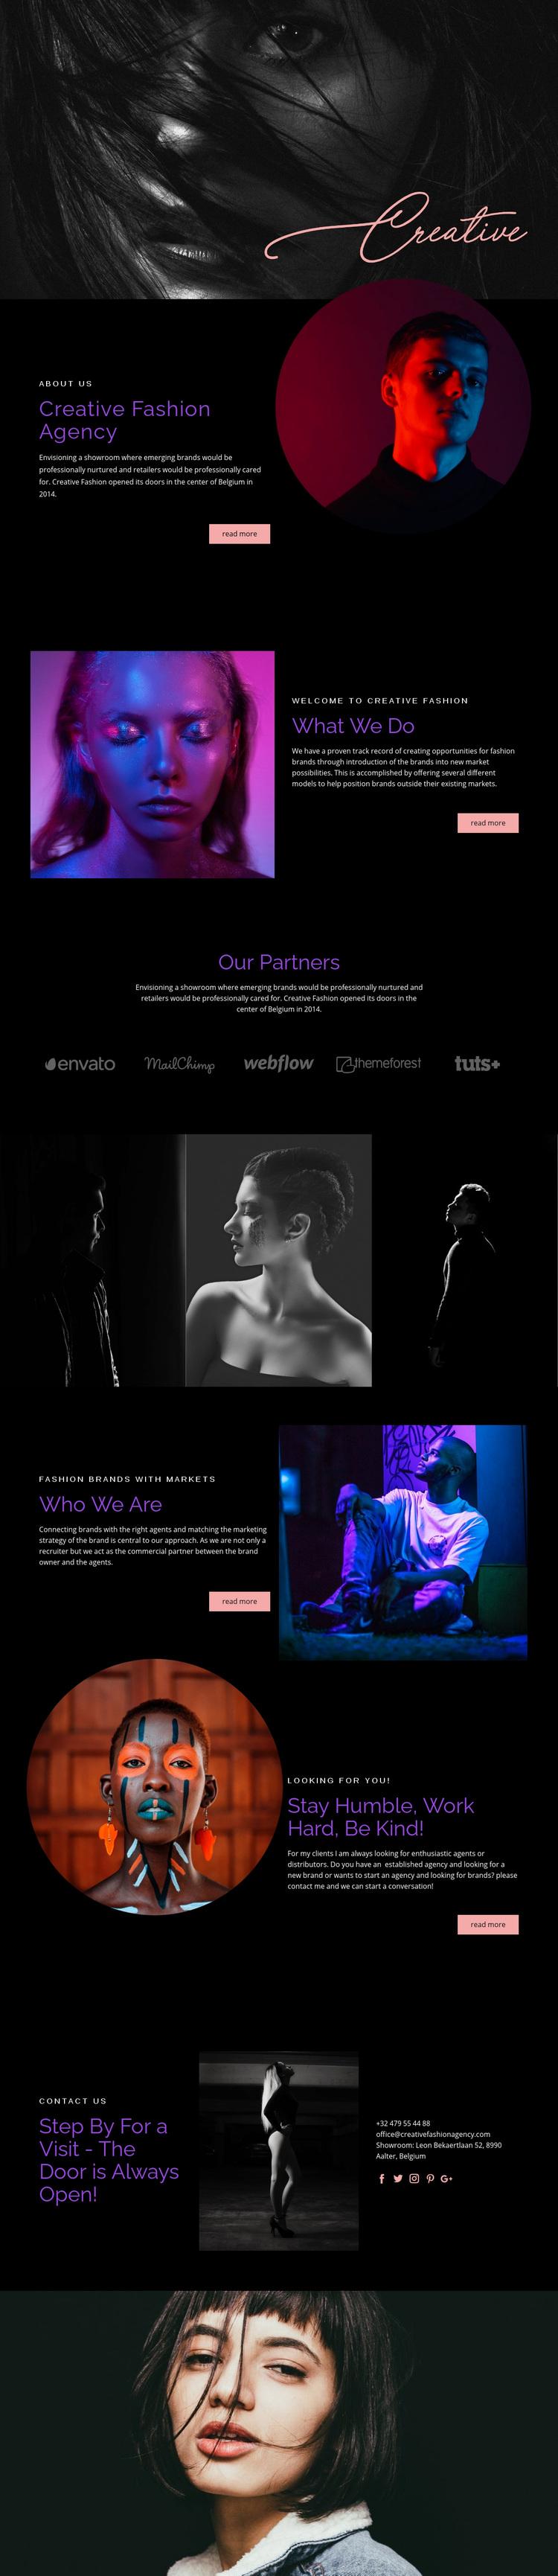 Creative Fashion Agency Web Page Designer